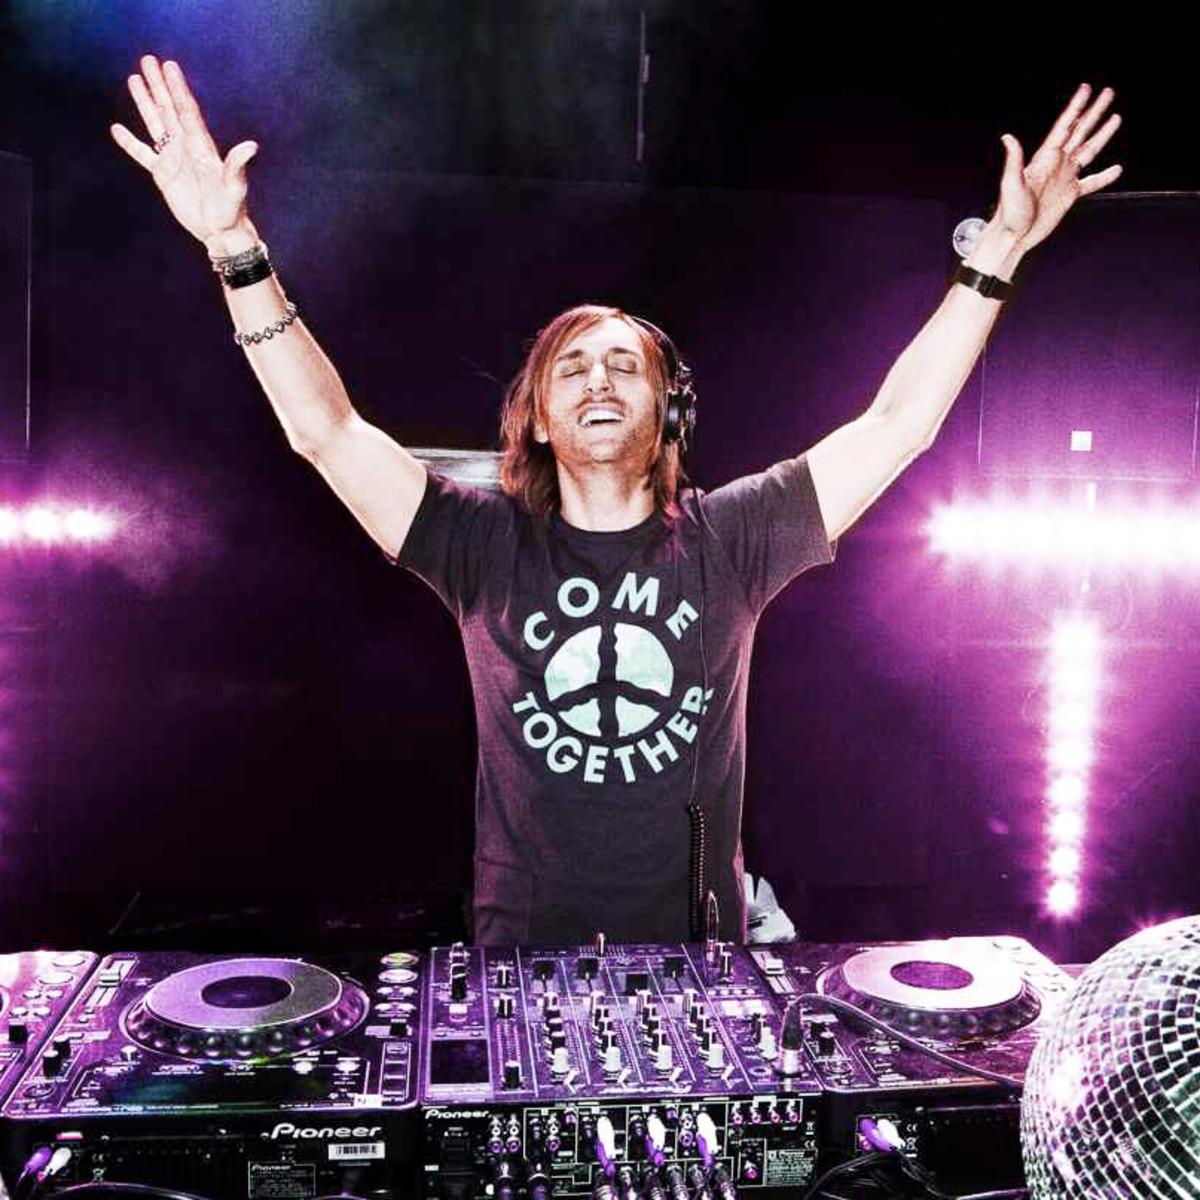 News_David Guetta_Jan 10